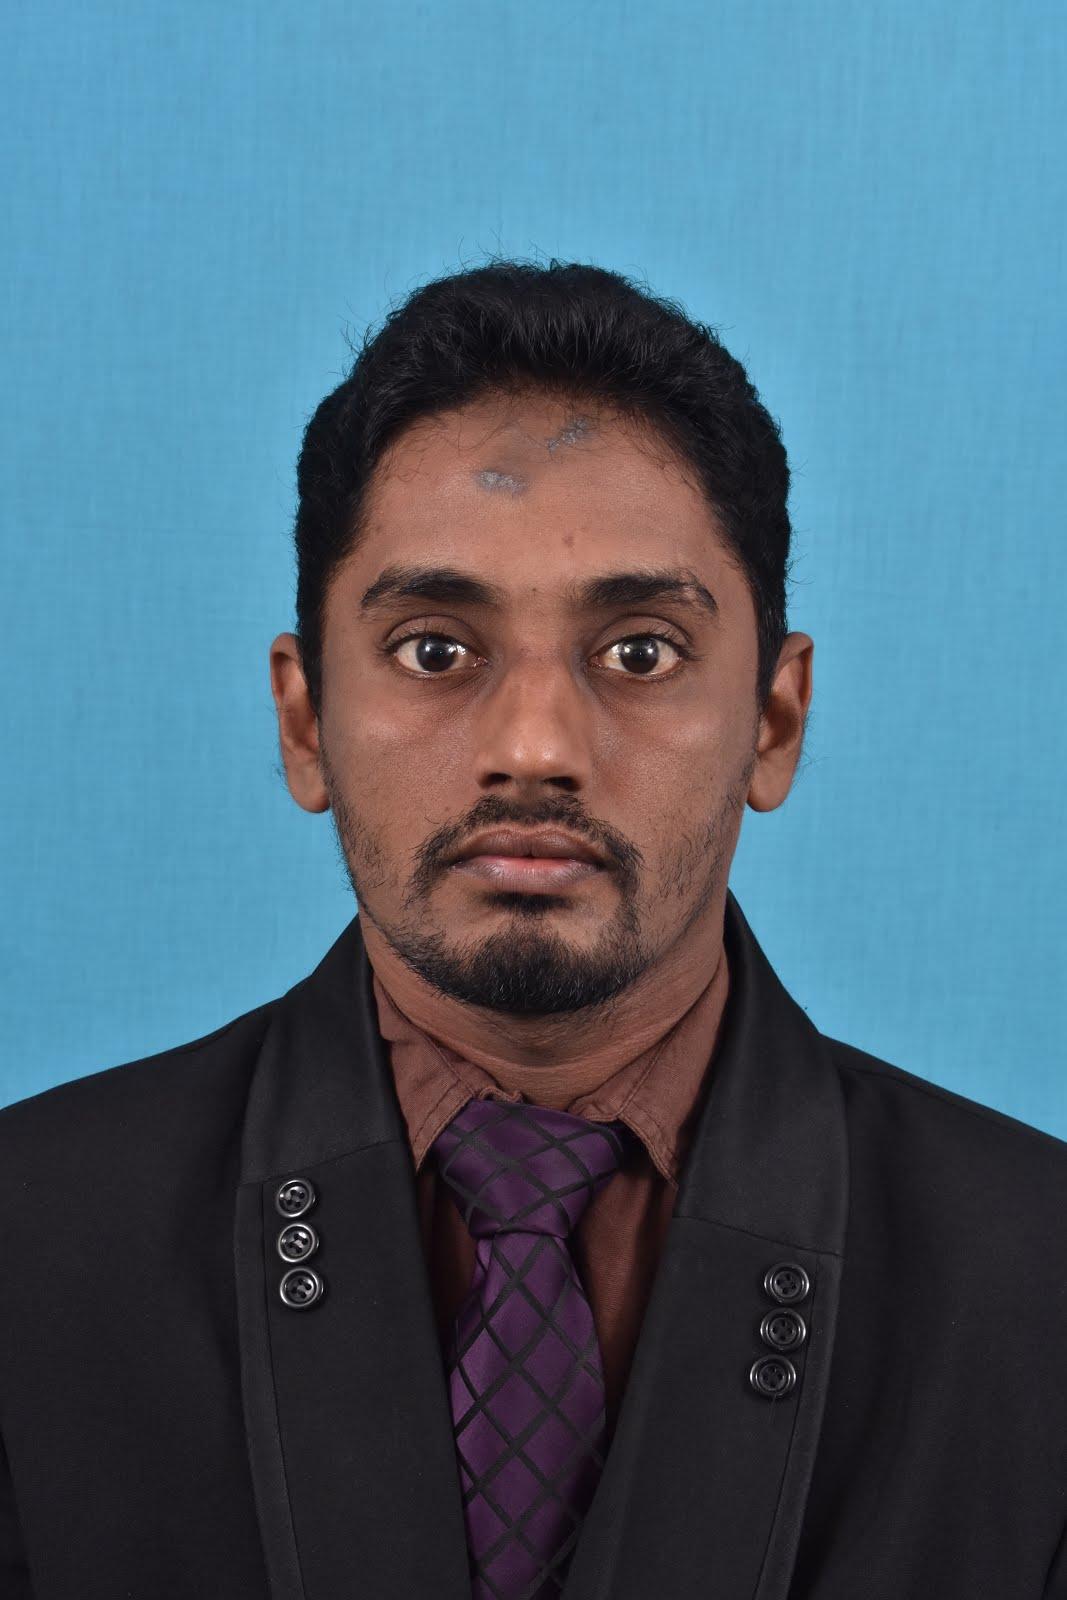 Kilabdeen Azeem Mohammed